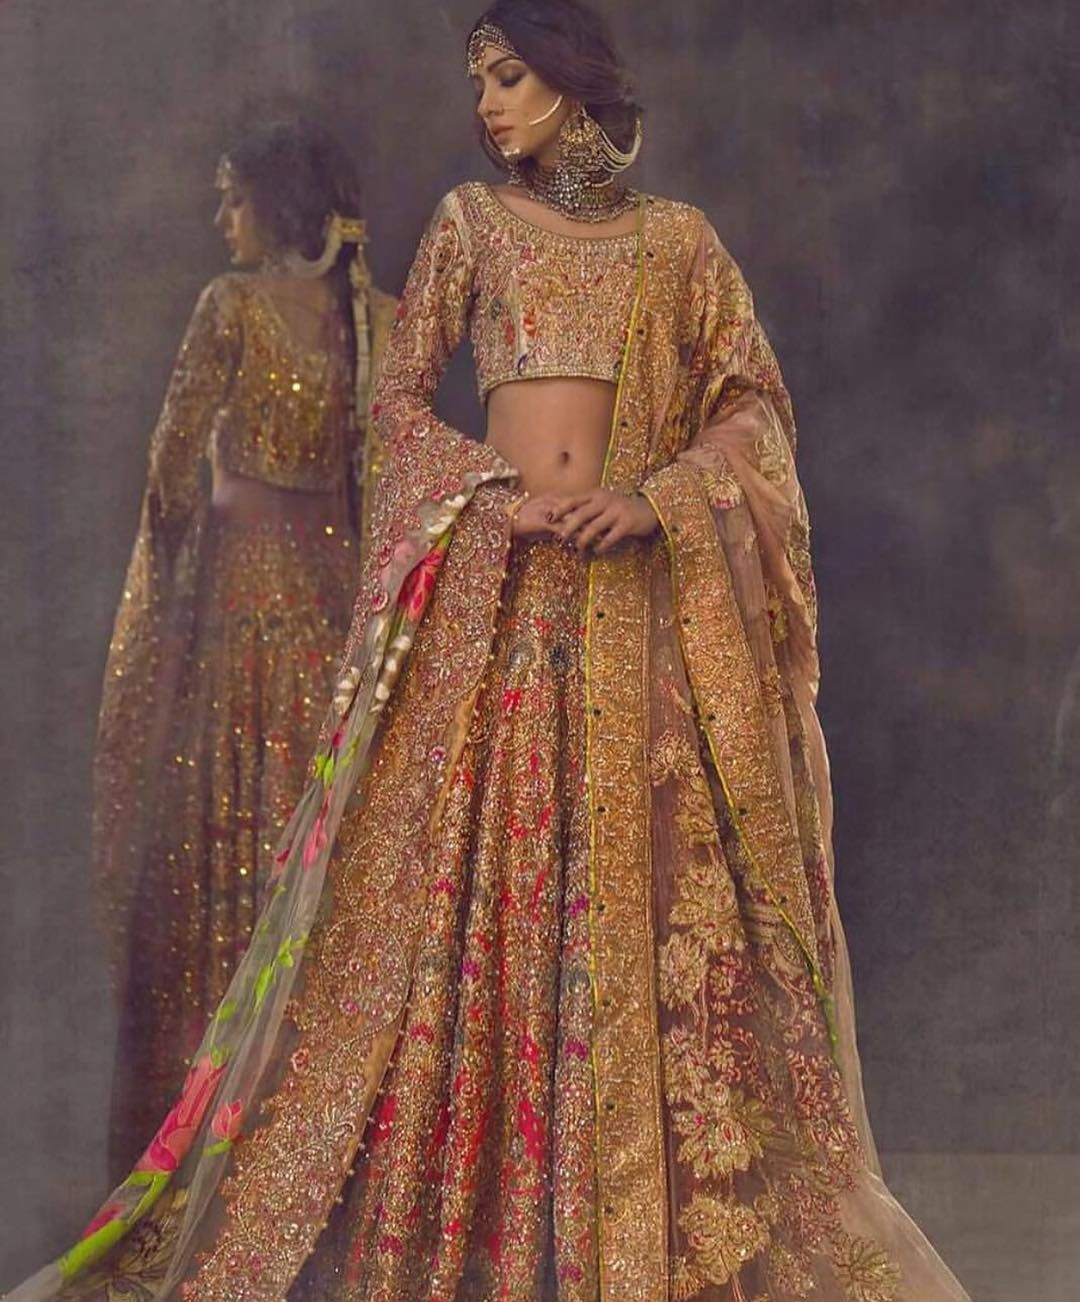 Pin von Fashion World auf Indian and pakistani costumes | Pinterest ...